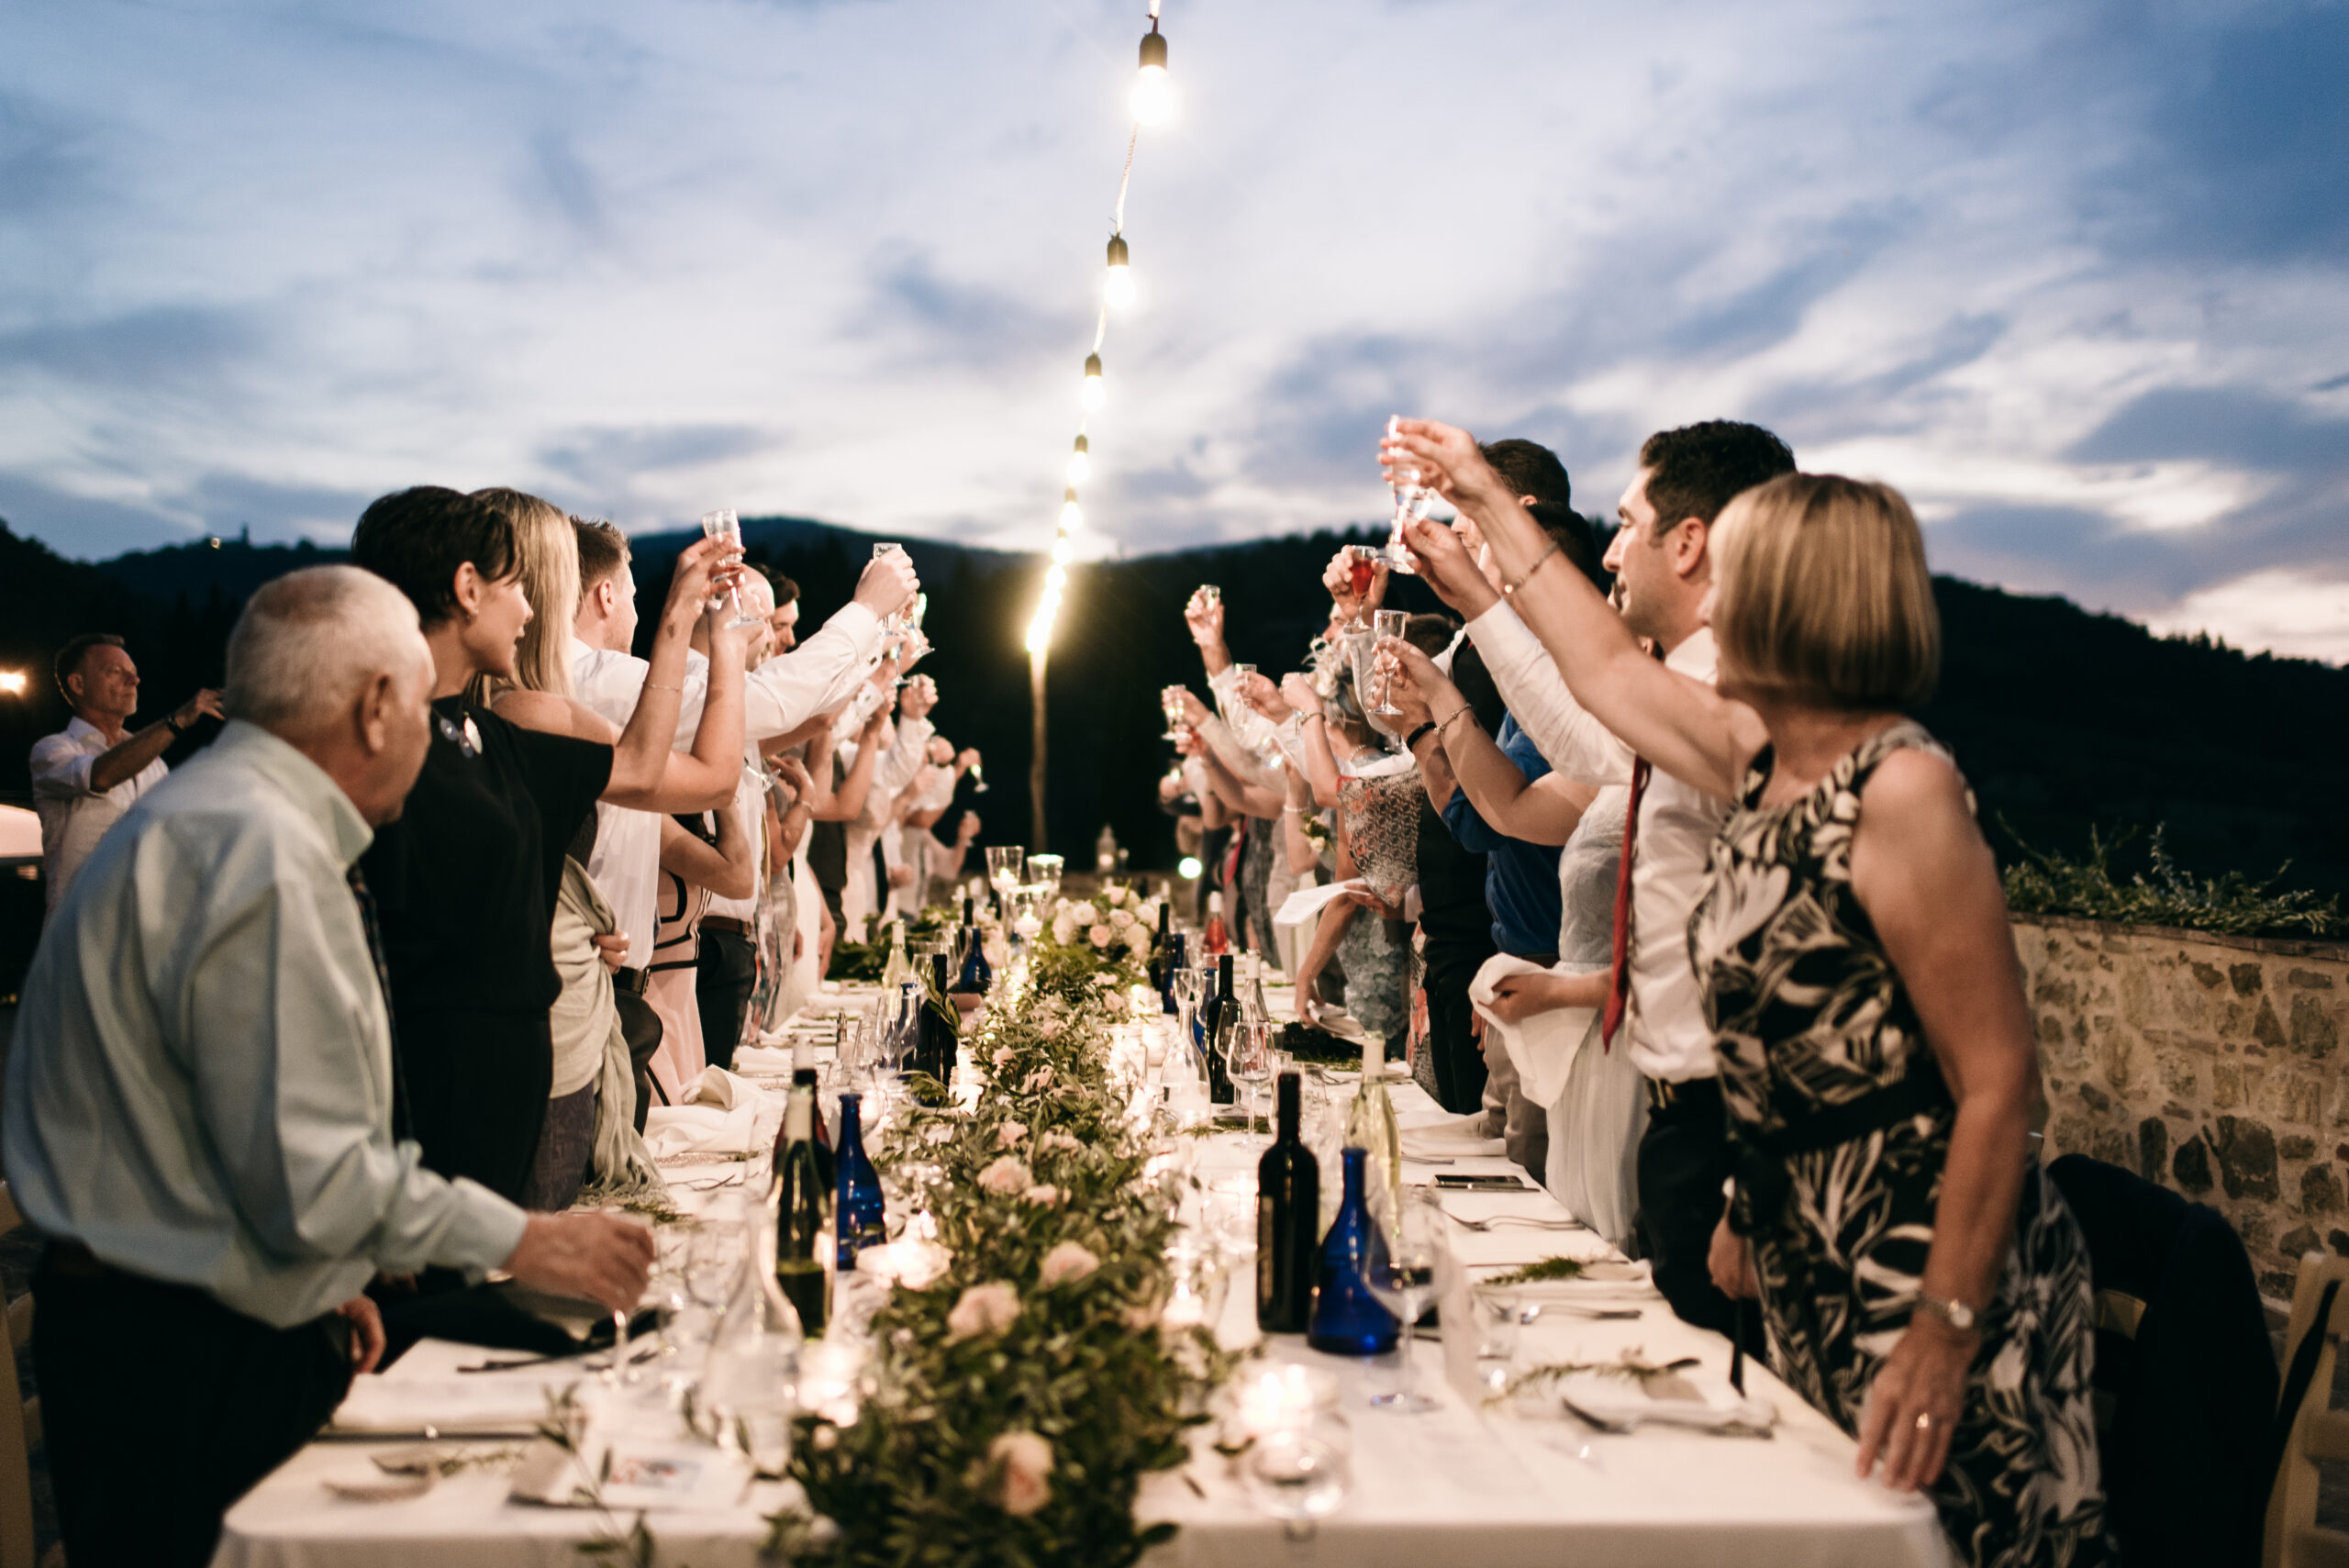 Family Celebration in Tuscany